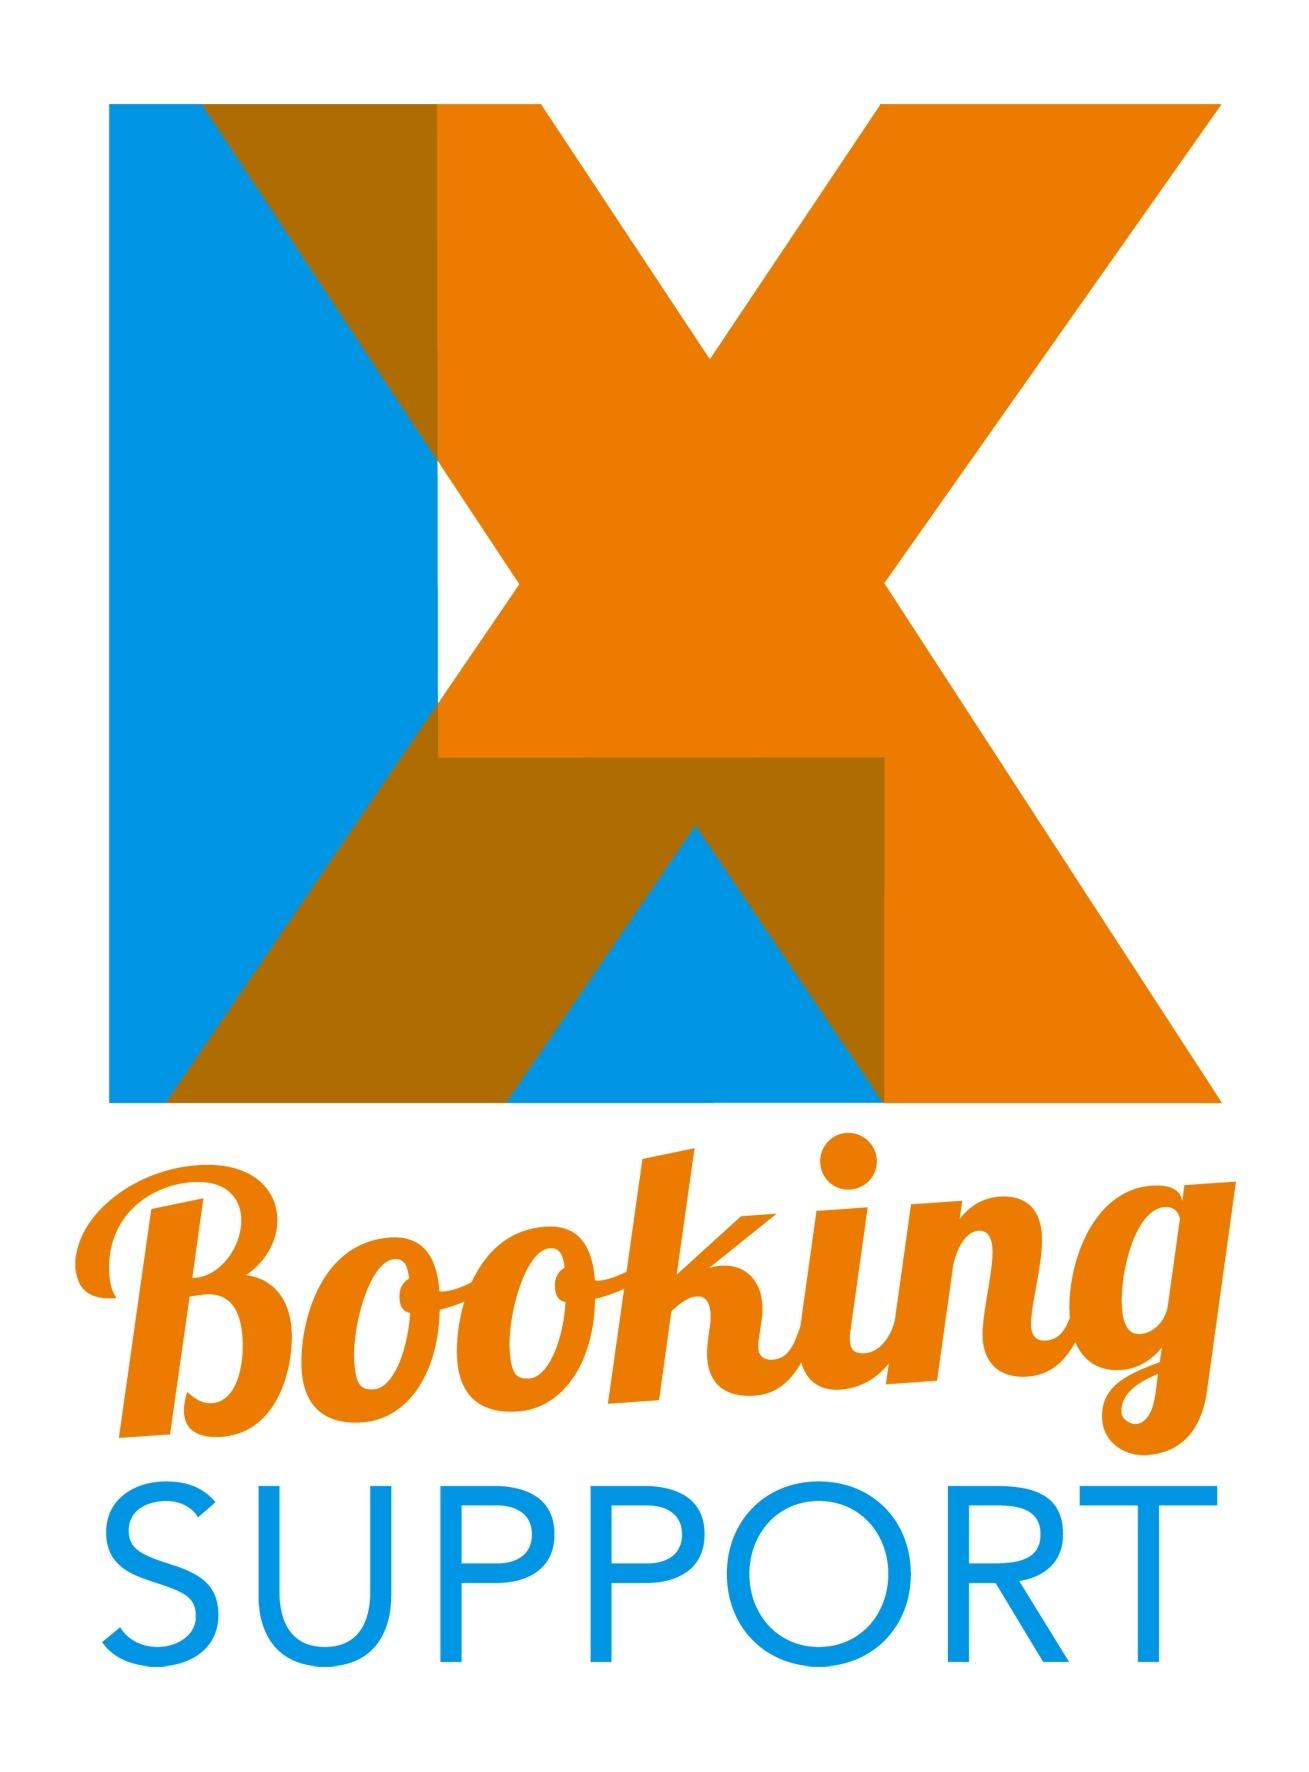 LXbookingsupport